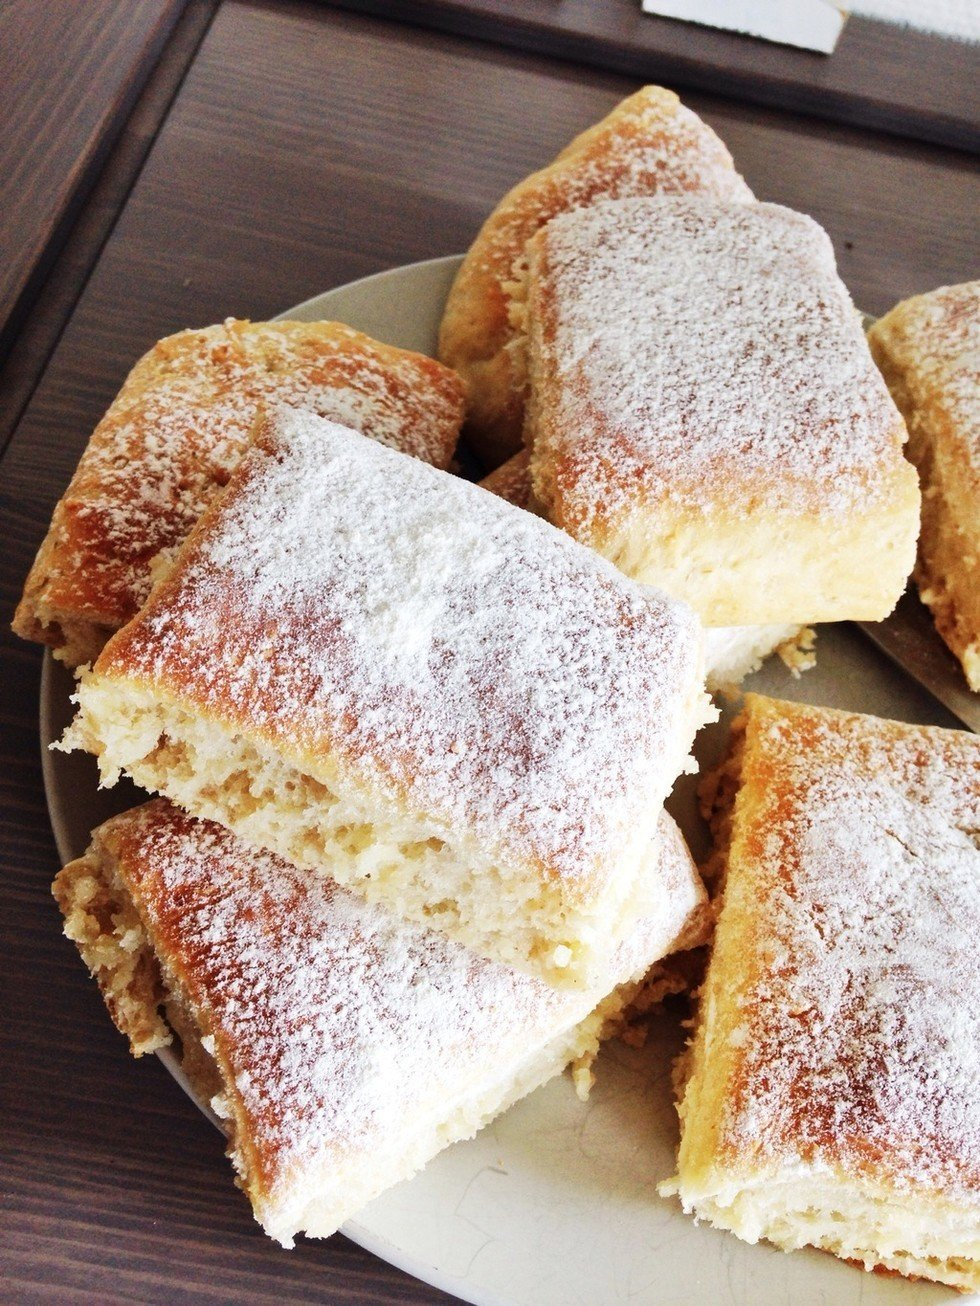 nyttigt bröd i långpanna